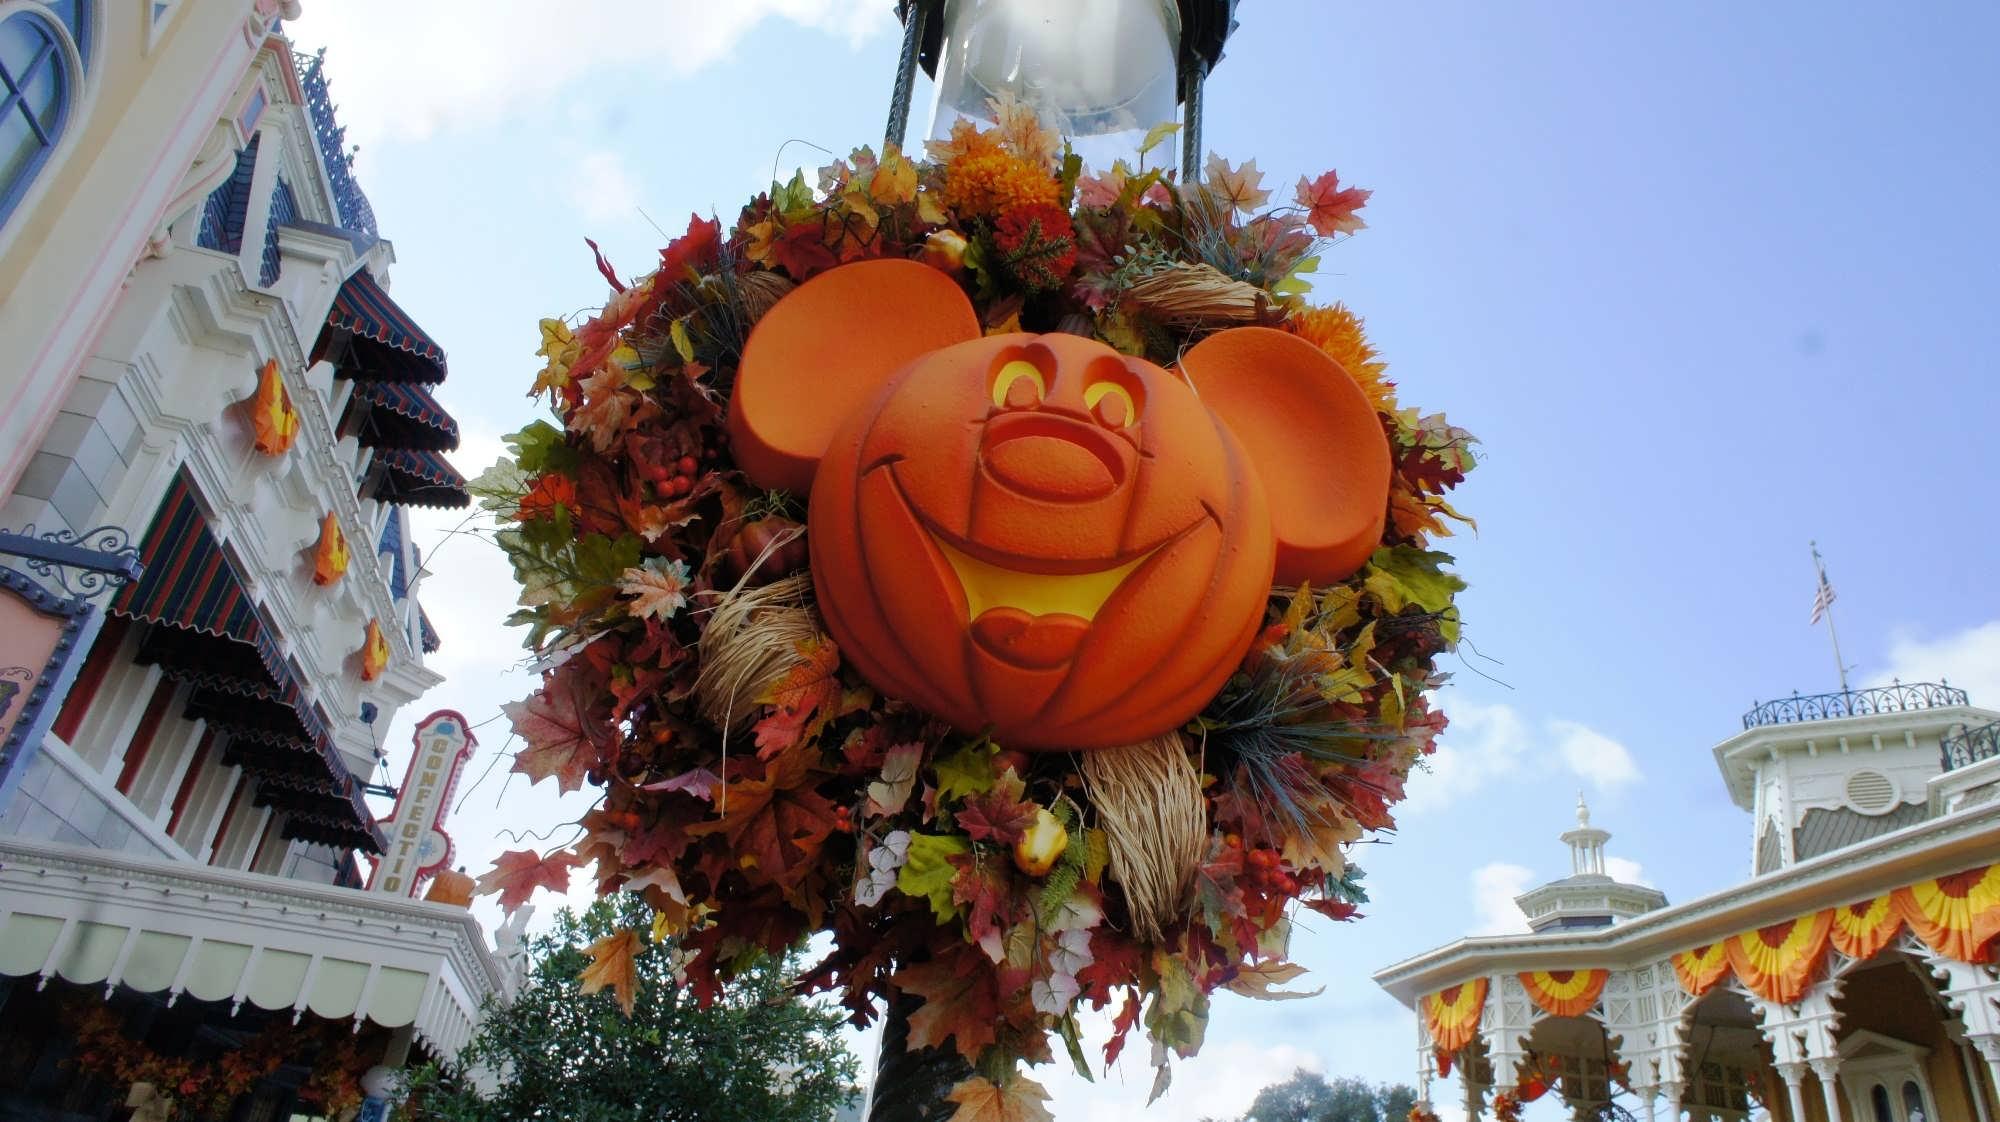 Magic Kingdom Fall Decorations   September 1, 2012.